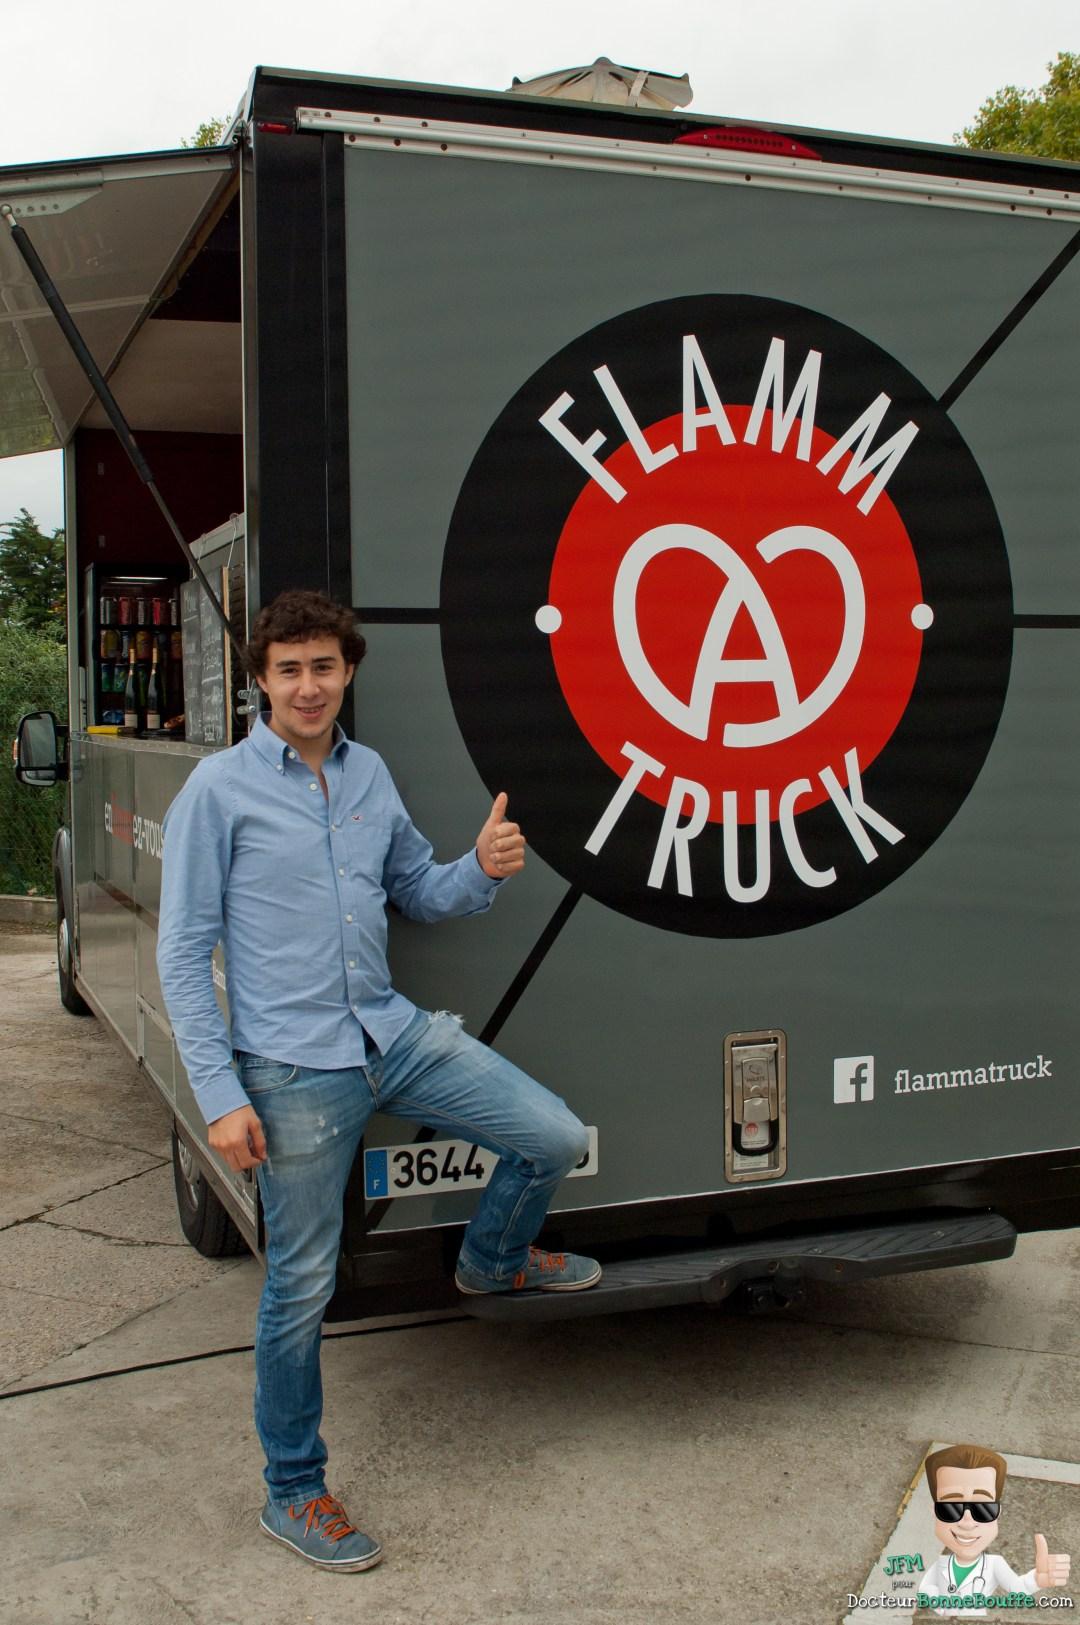 Arthur Riehl, co-fondateur du foodtruck FLAMMATRUCK